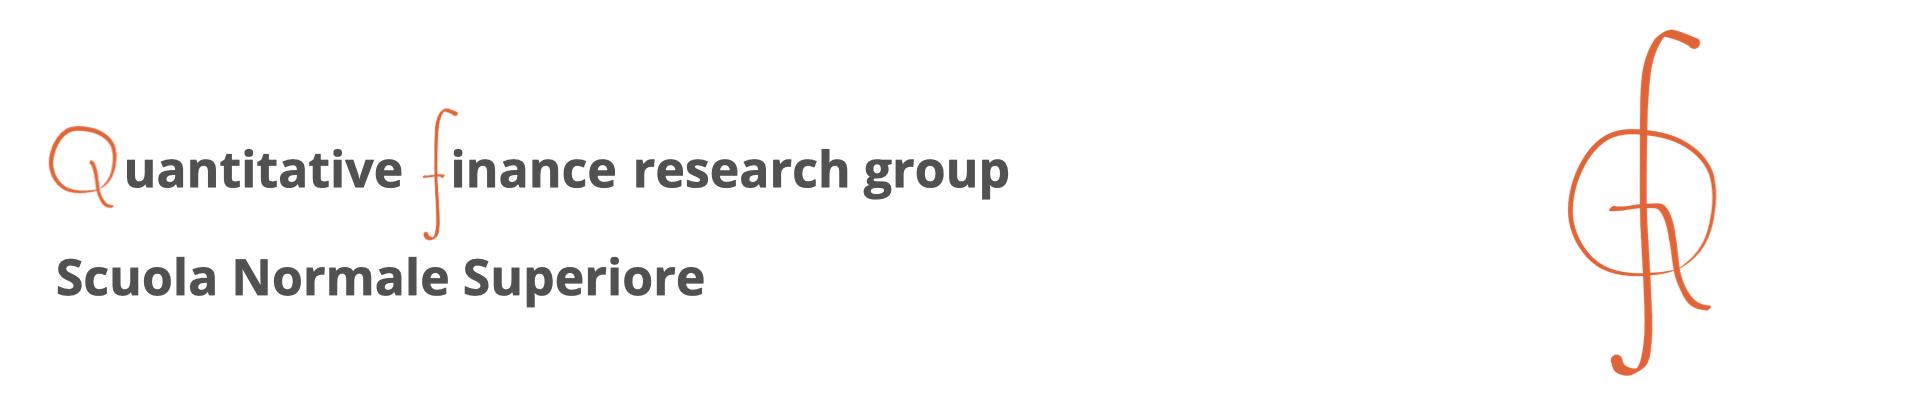 Quantitative Finance Research Group